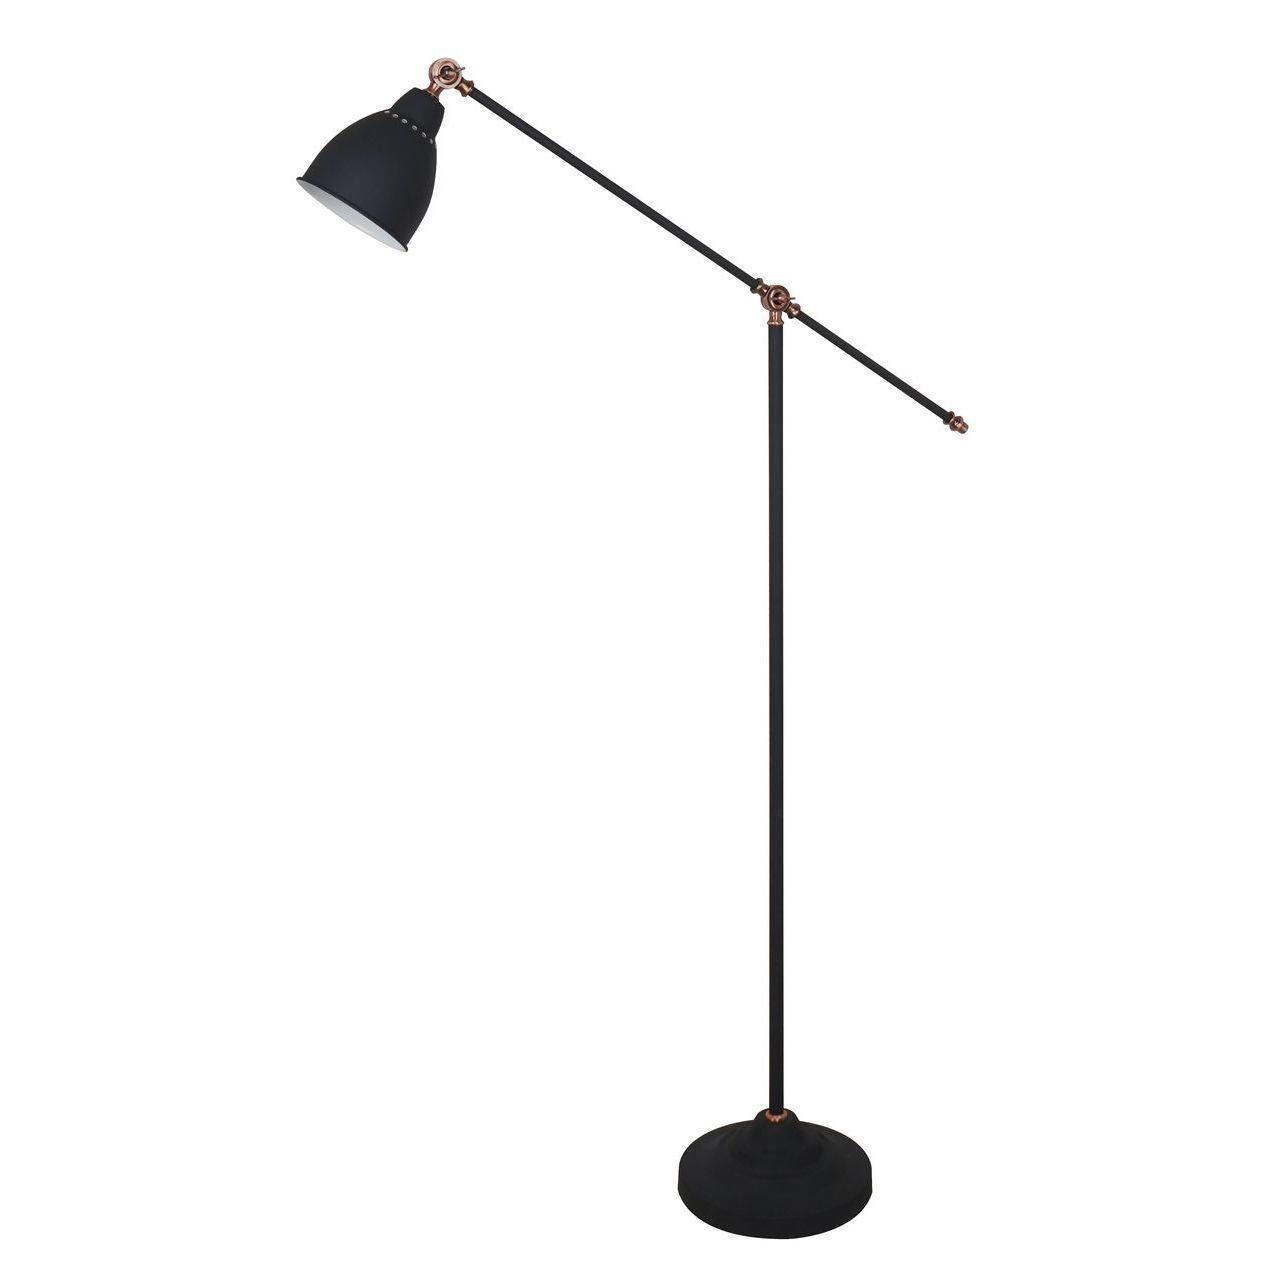 Торшер Arte Lamp Braccio A2054PN-1BK arte lamp торшер arte lamp 43 a2054pn 1ss